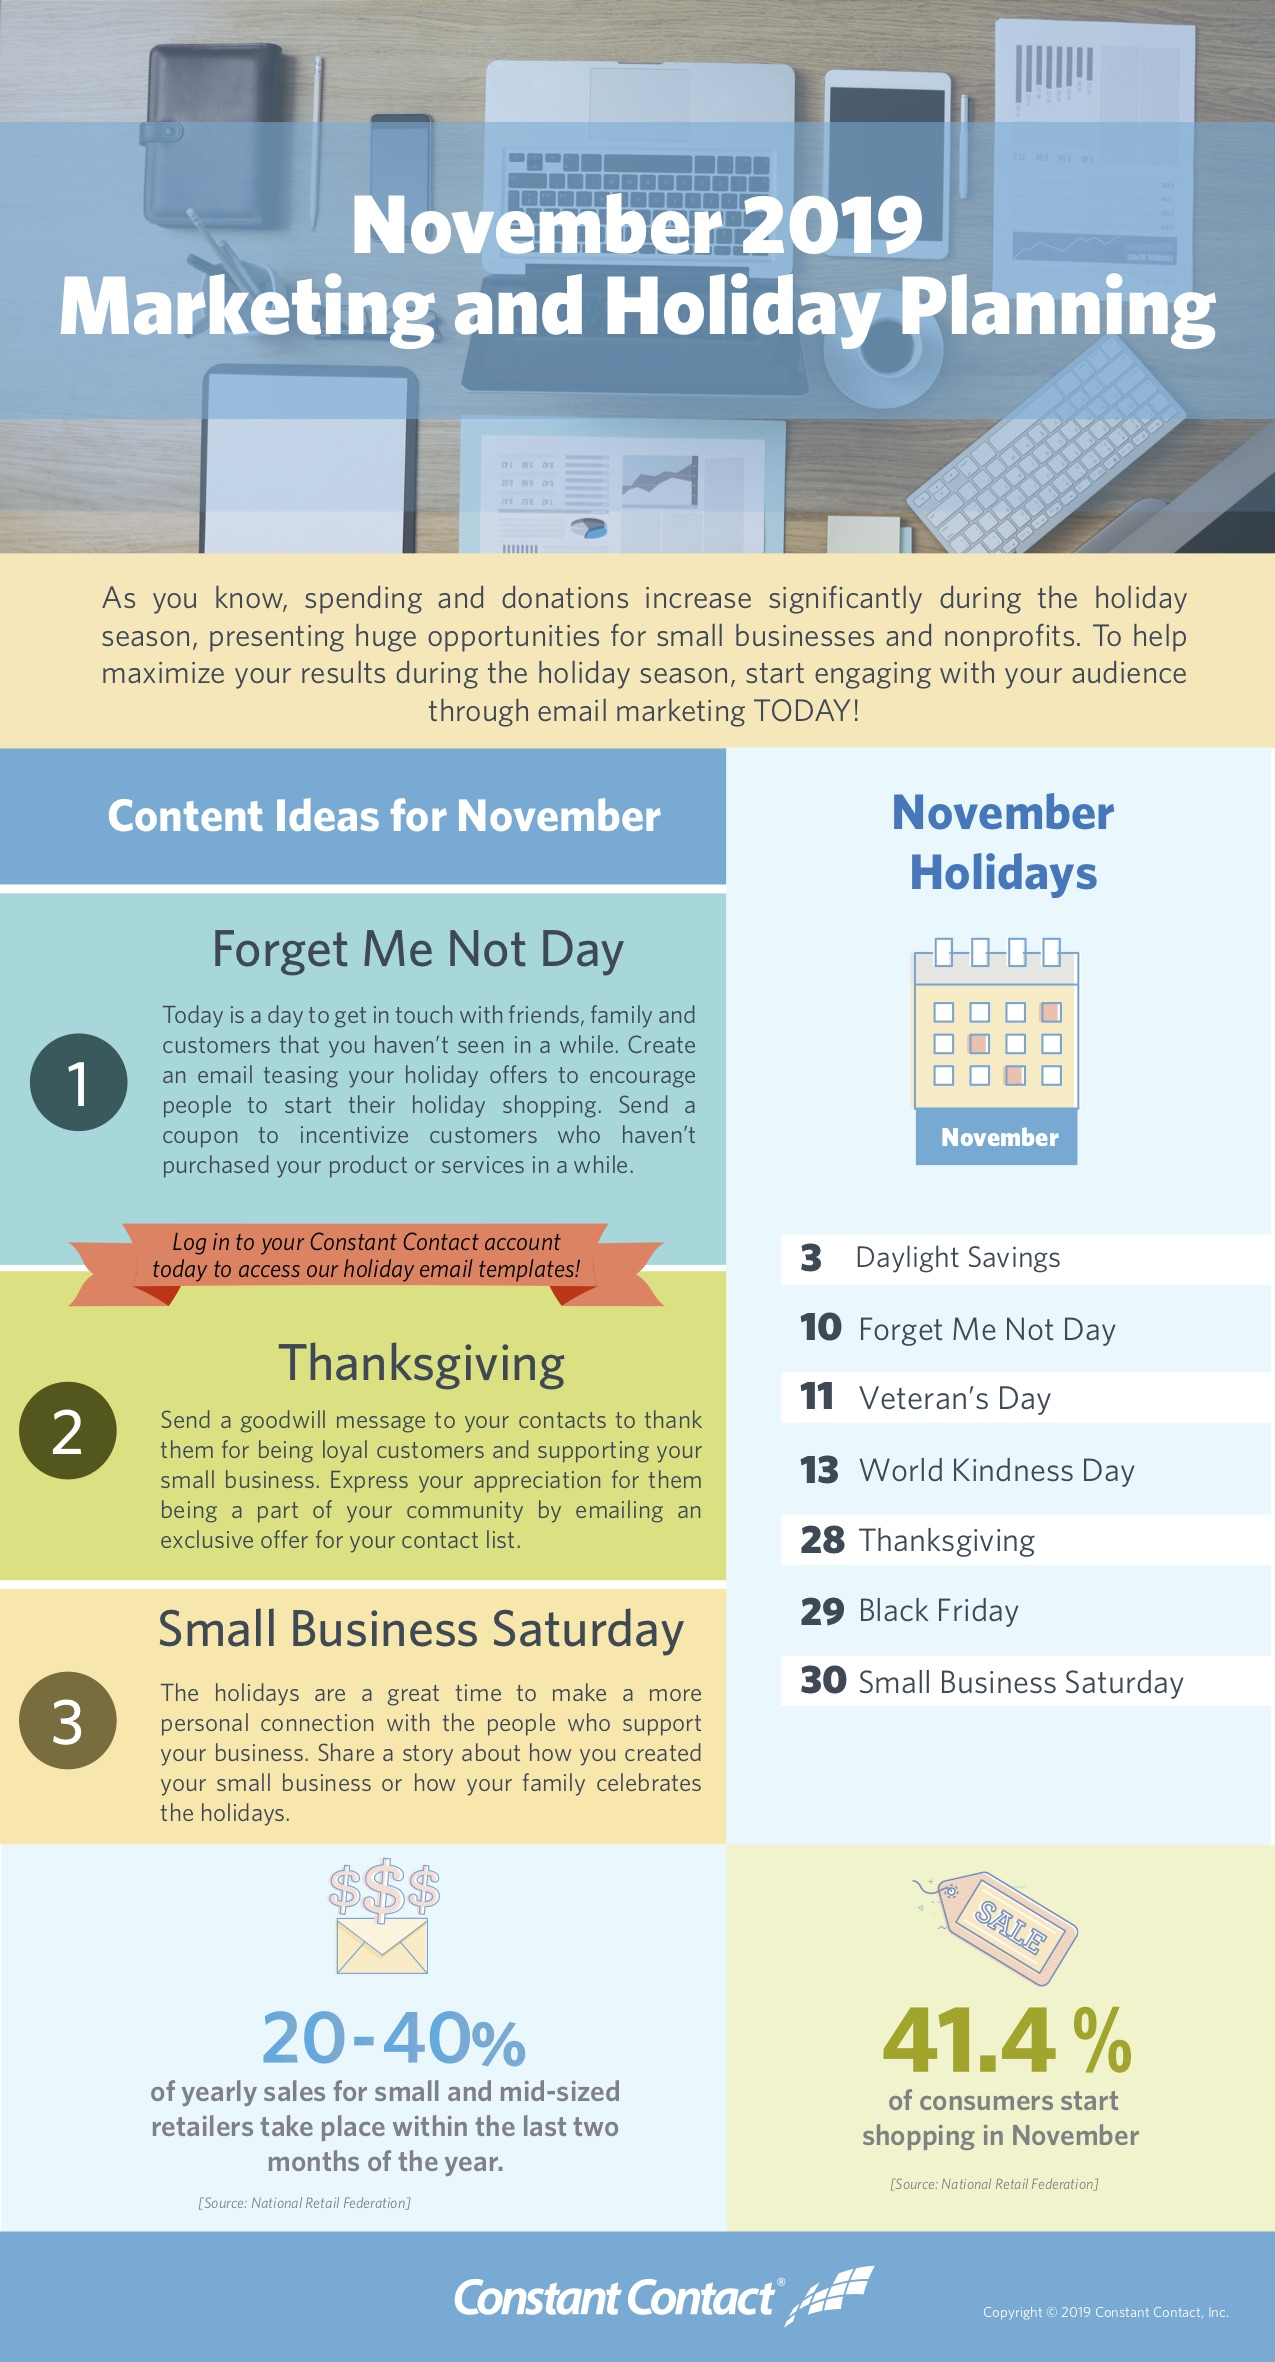 November 2019 Holiday Planning